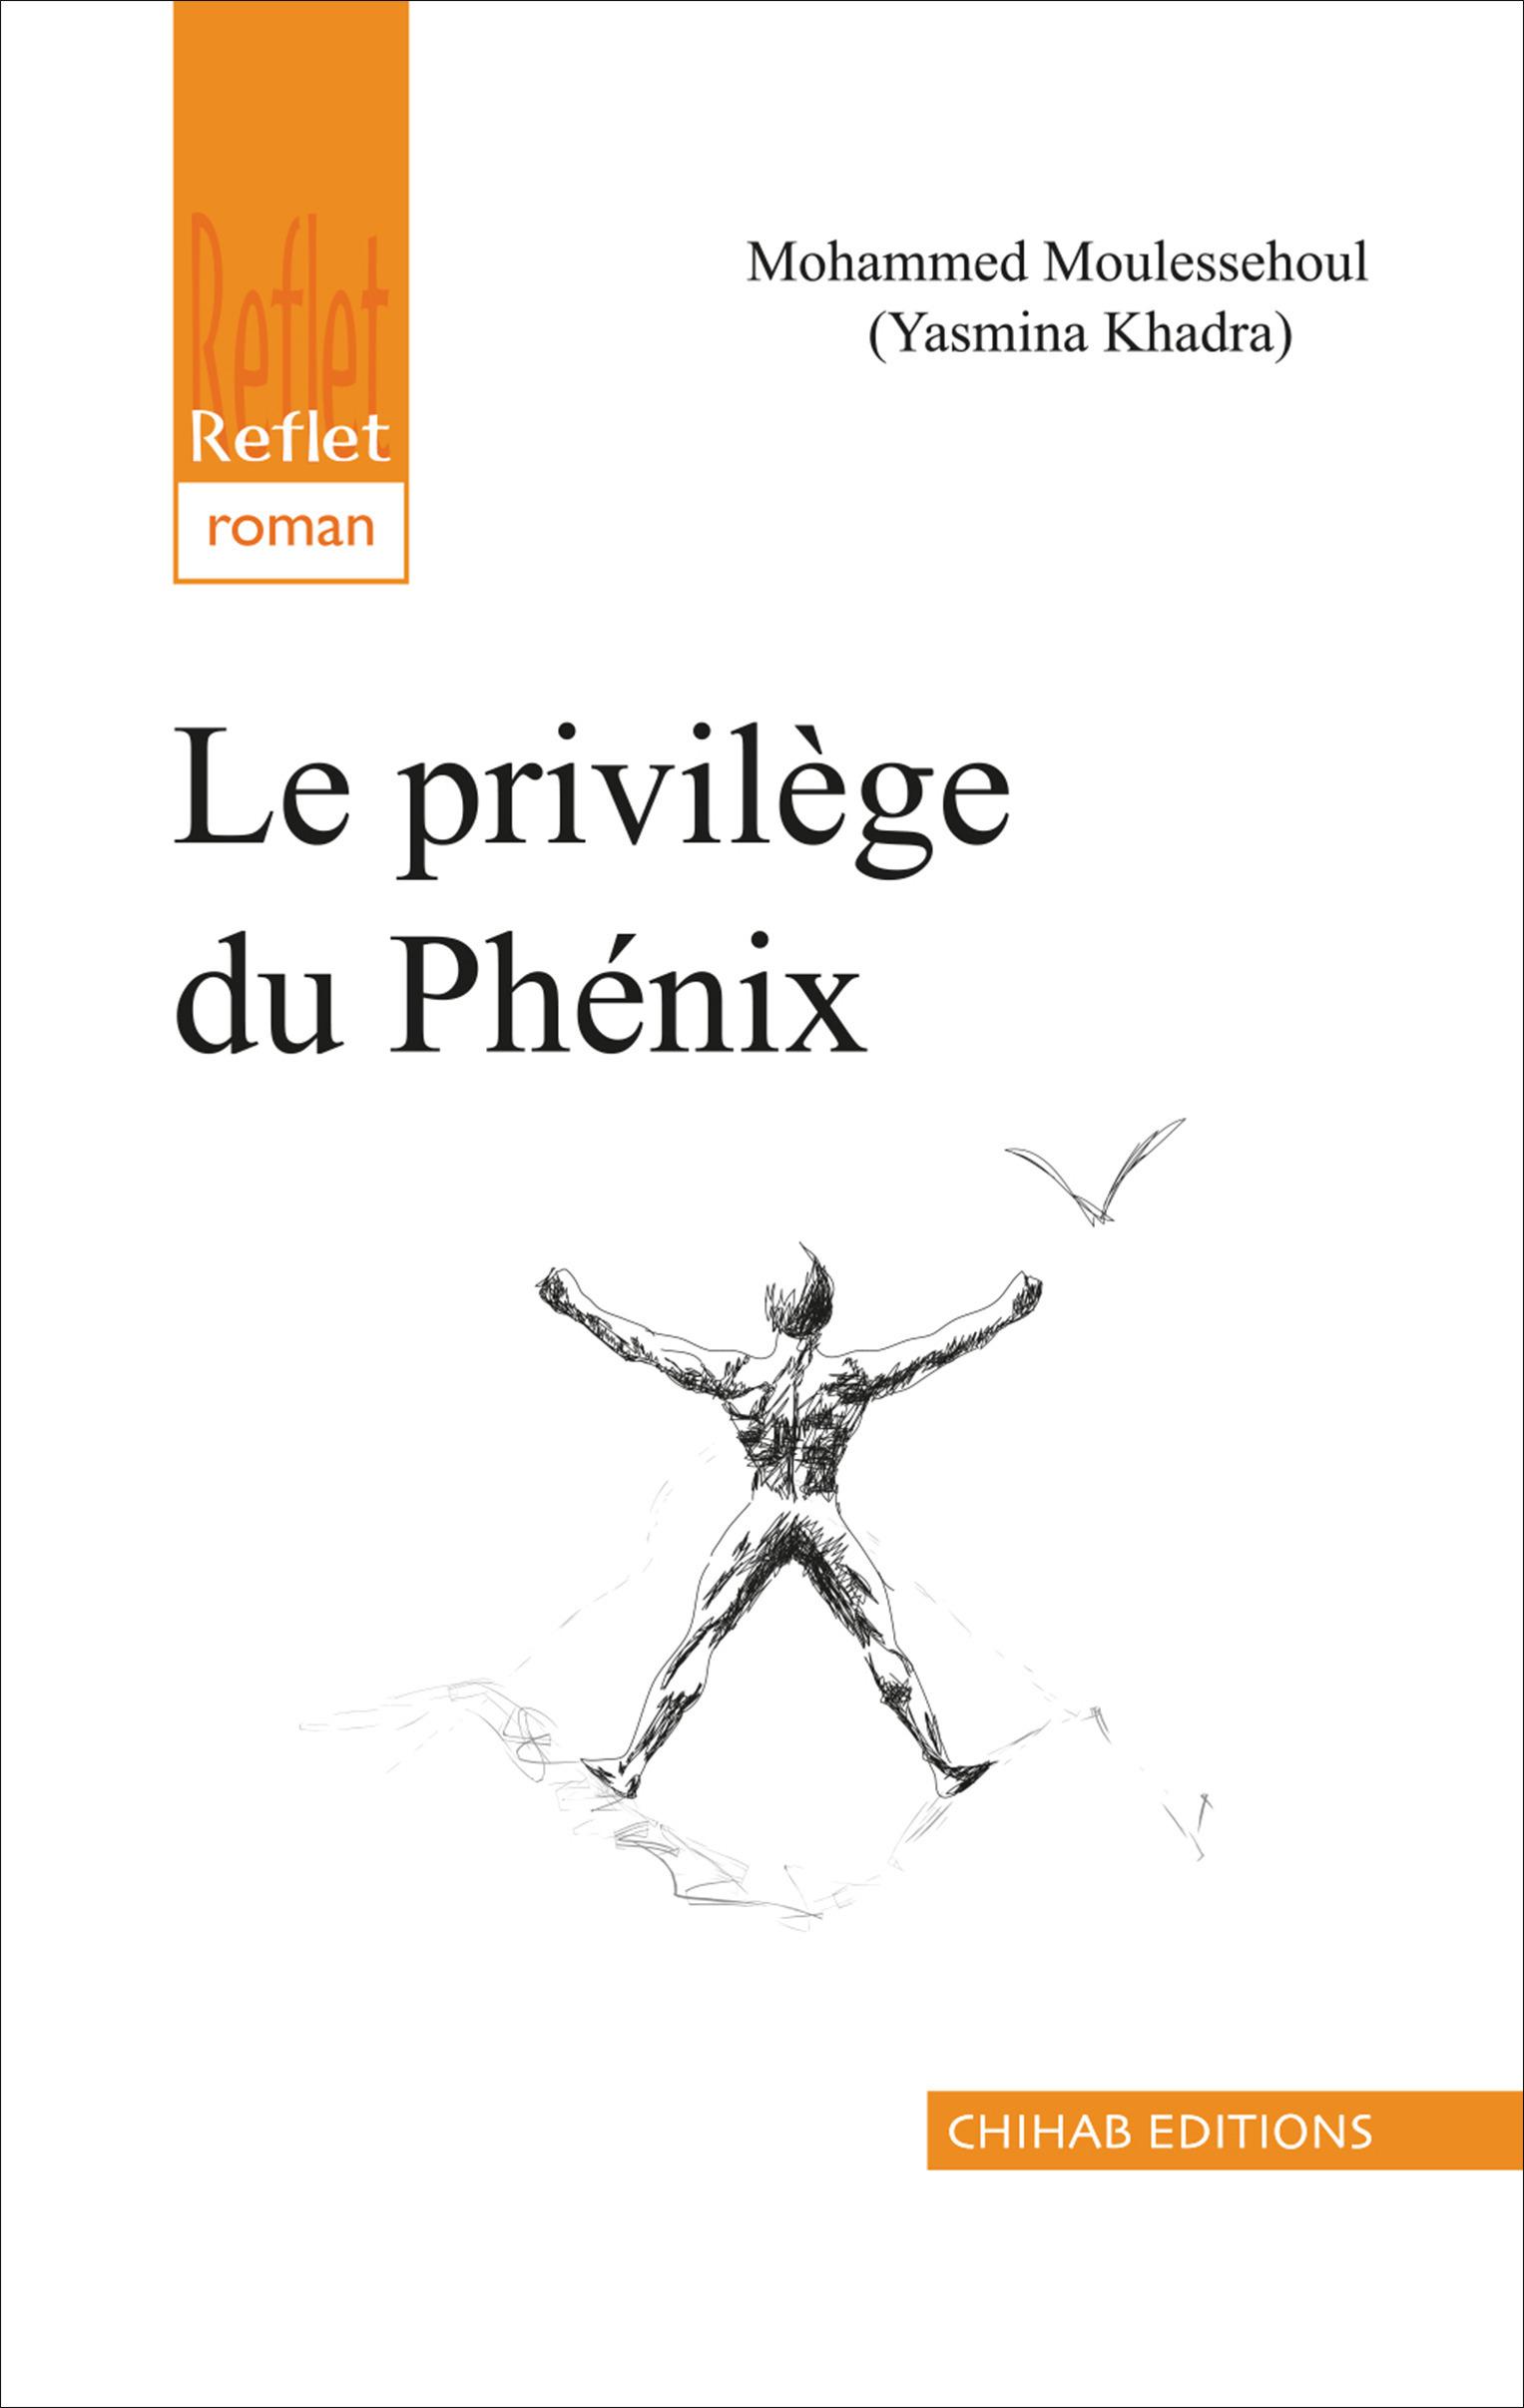 Le privilège du Phénix